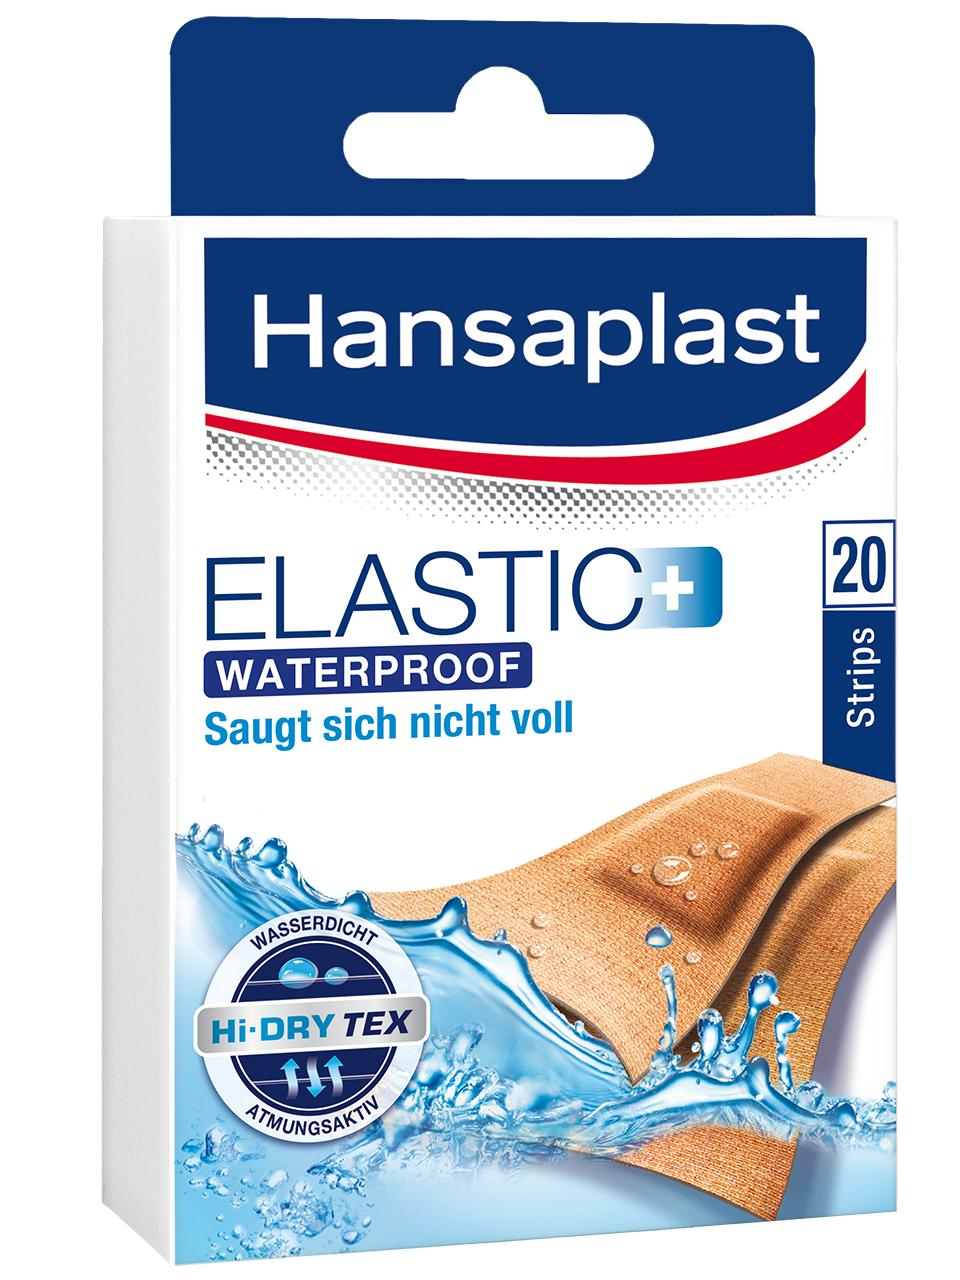 Hansaplast Elastic+ Waterproof Strips